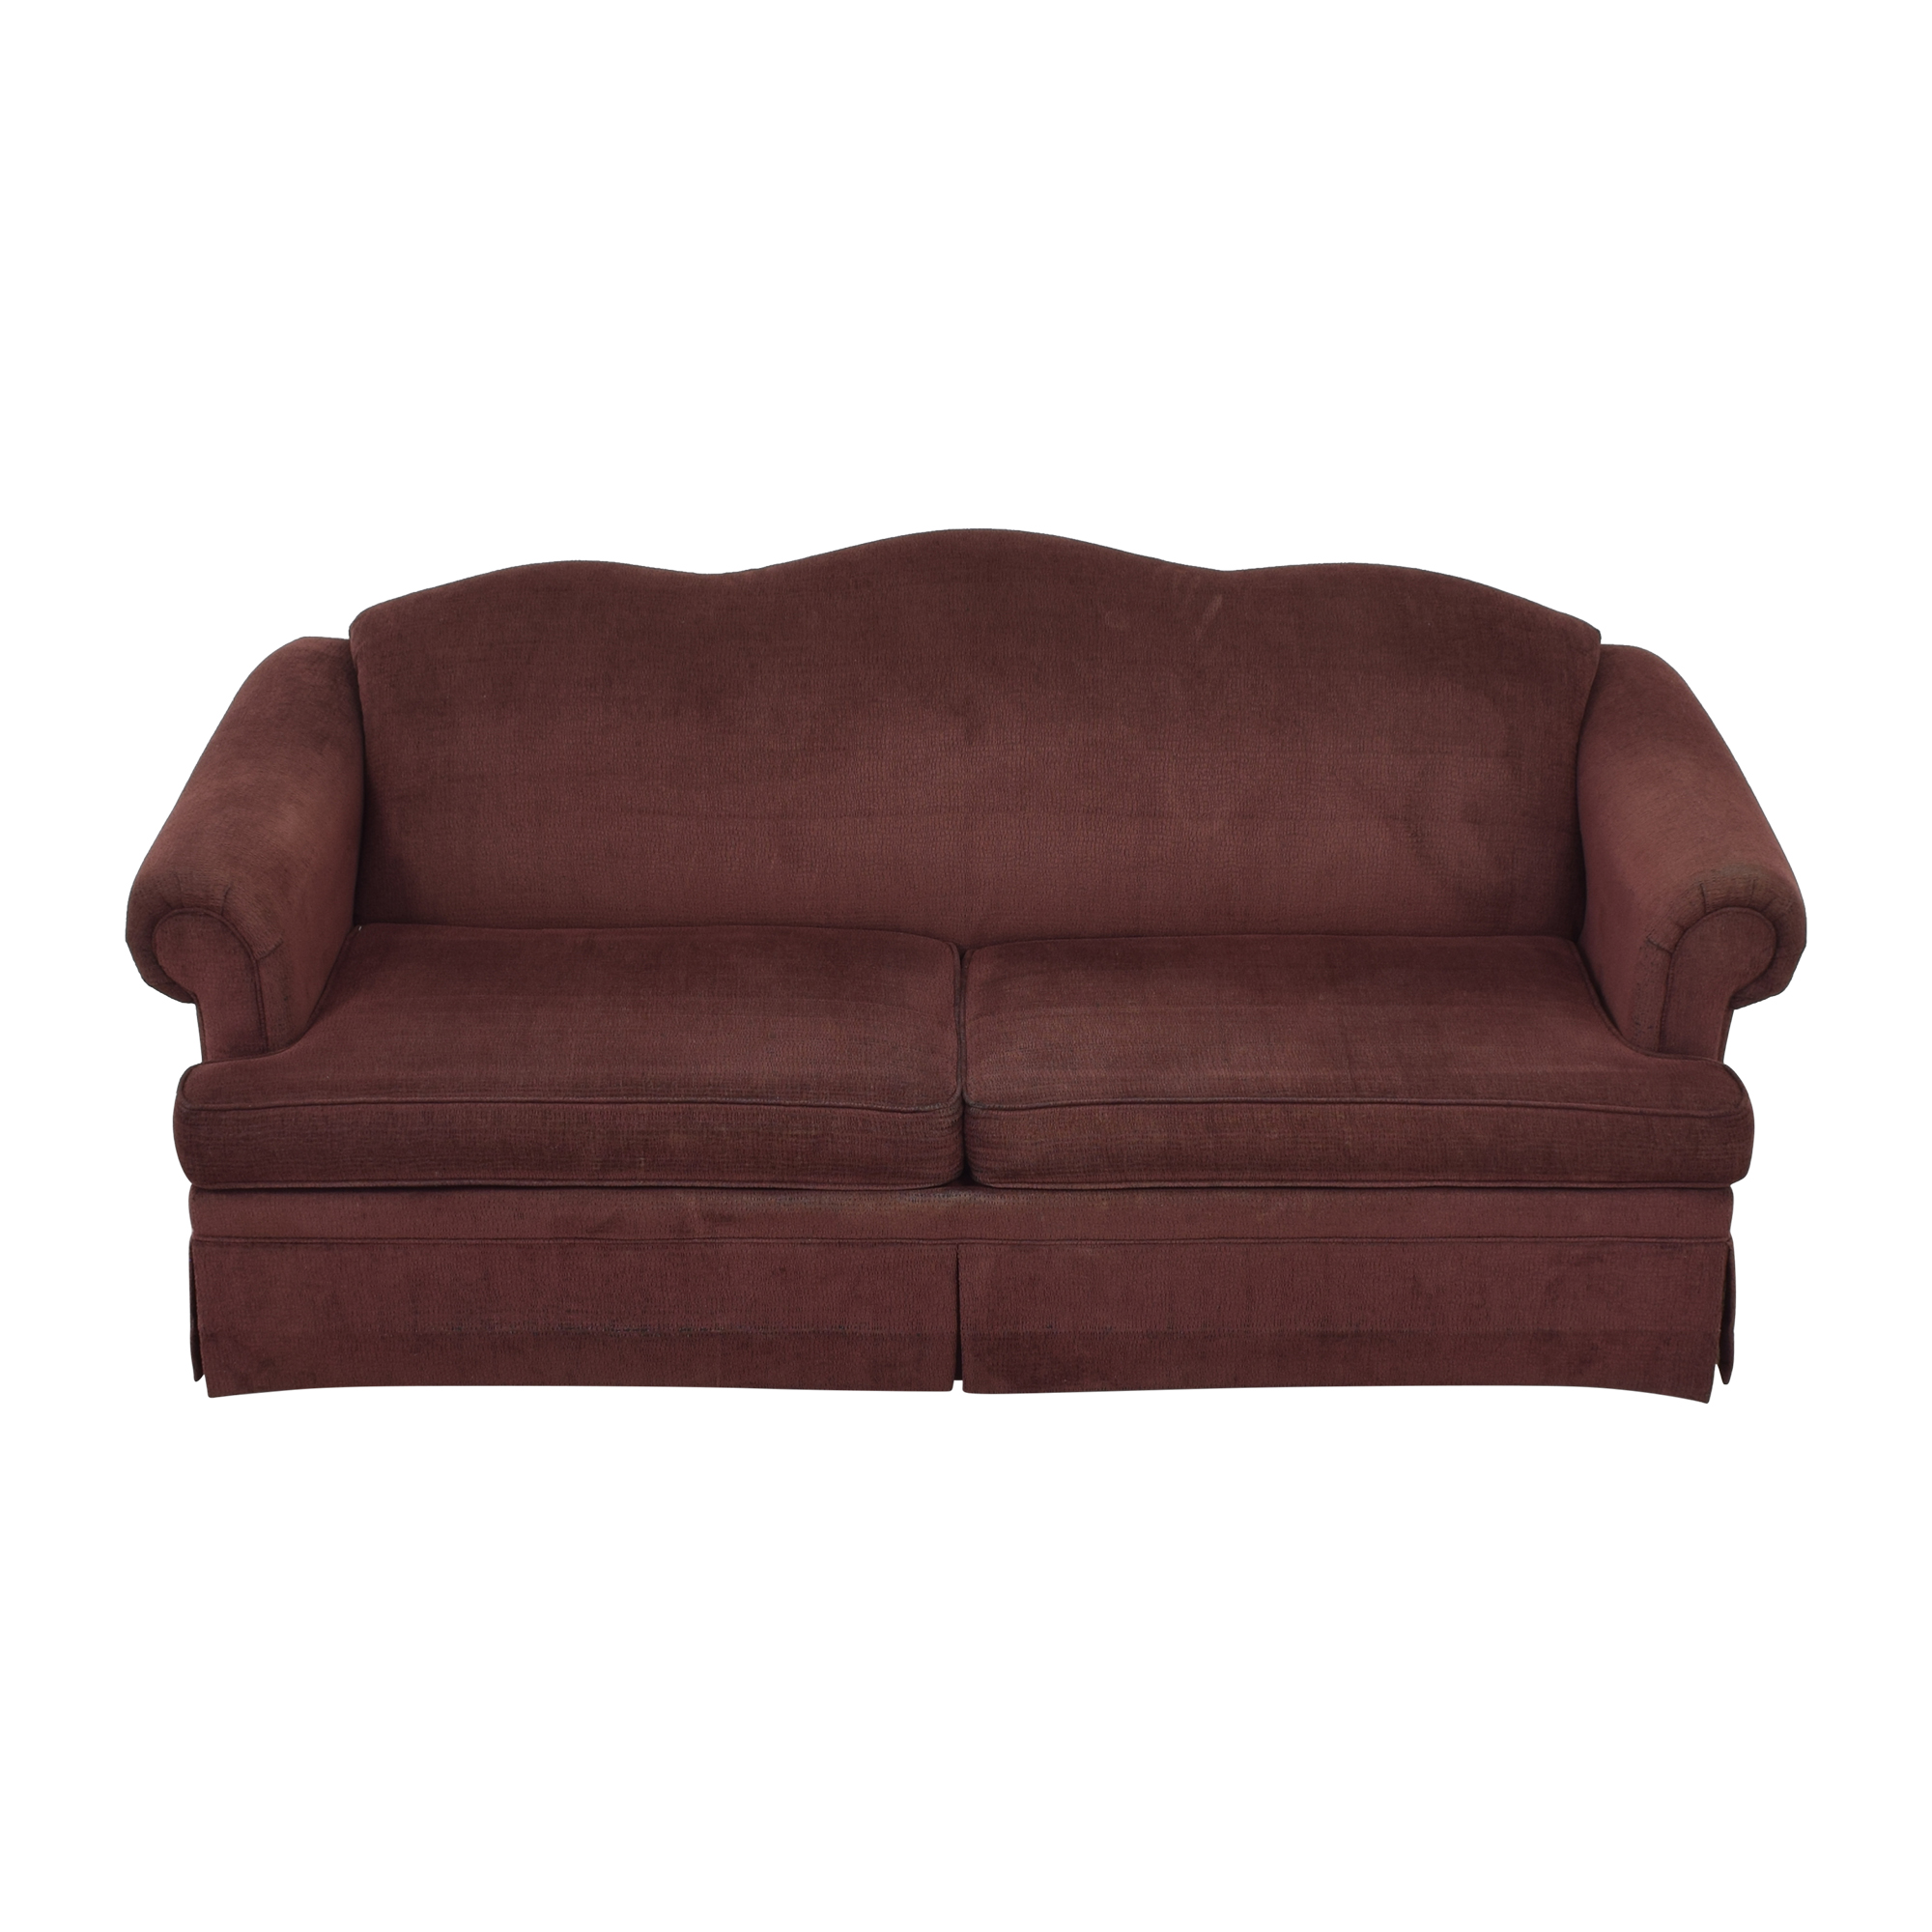 shop Flexsteel Rolled Arm Sofa Flexsteel